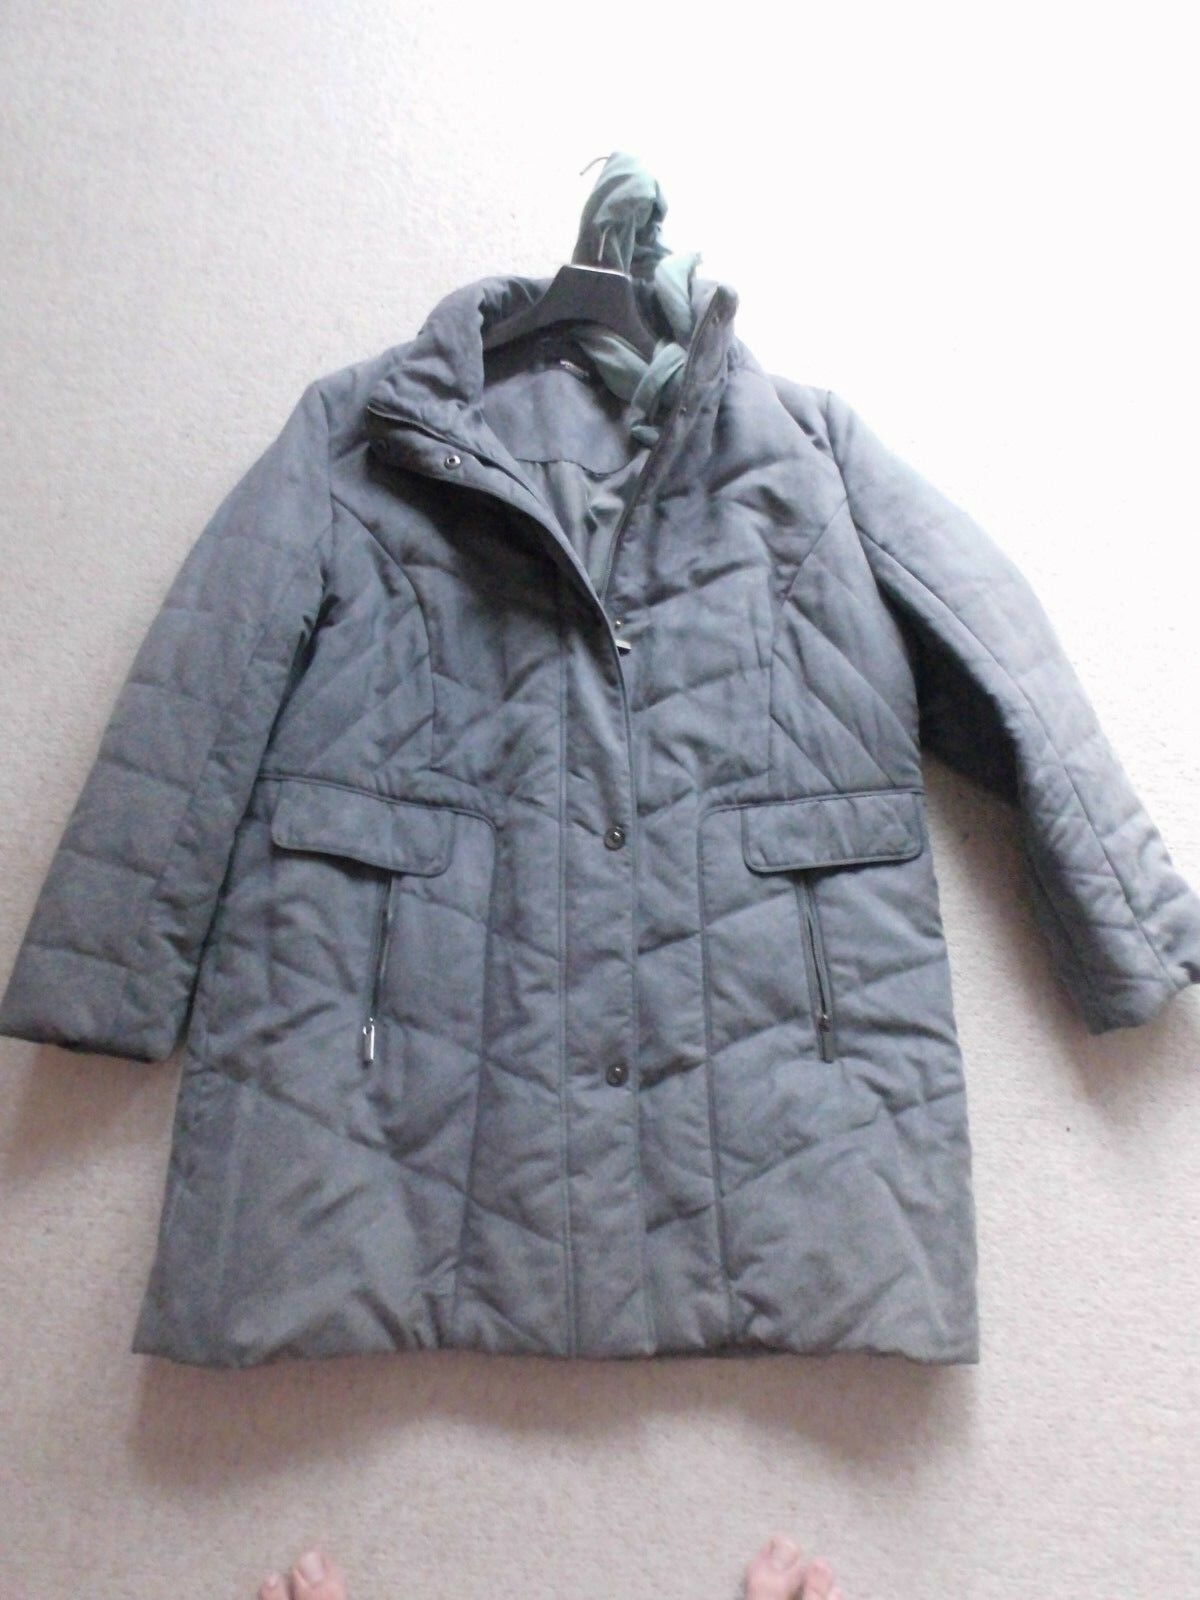 Steppmantel  Wintermantel ,grau  Gr 48 , Walbusch, ungetragen